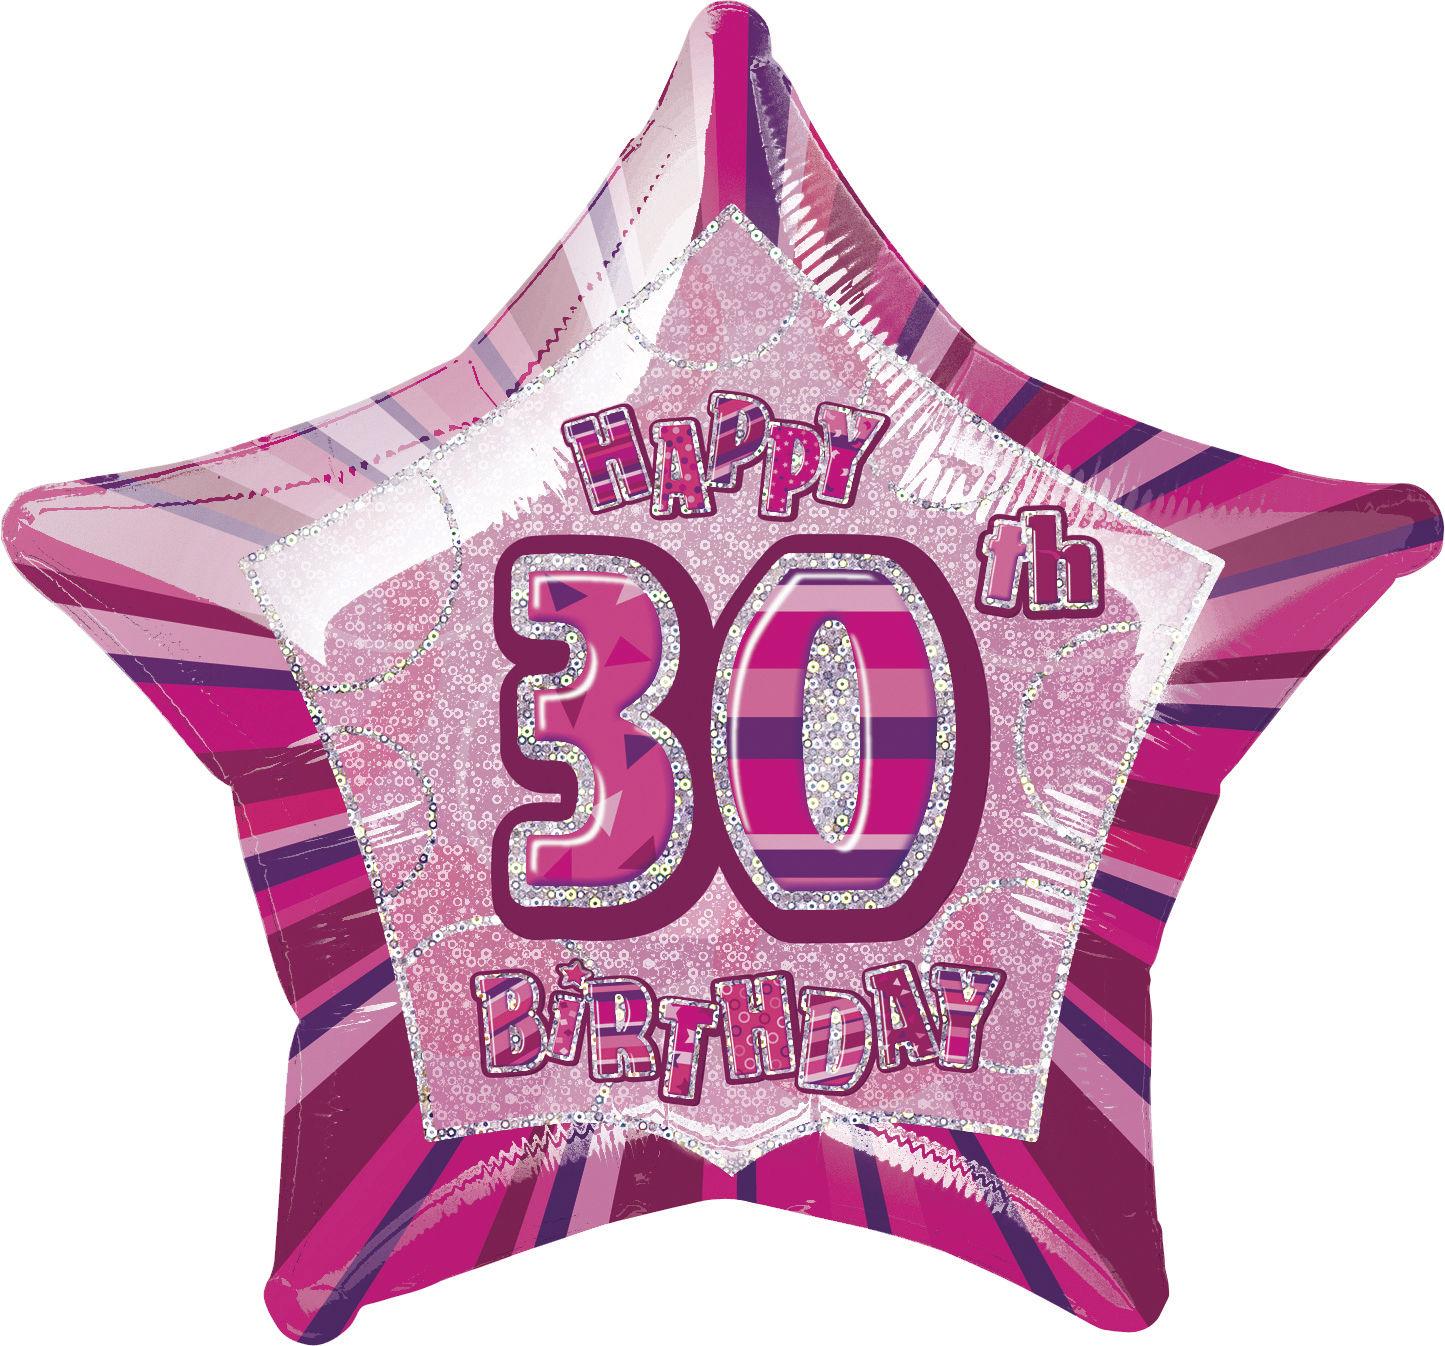 Glitz Black//Silver 30th Birthday Party Tableware Decoration Plates Banners Age30